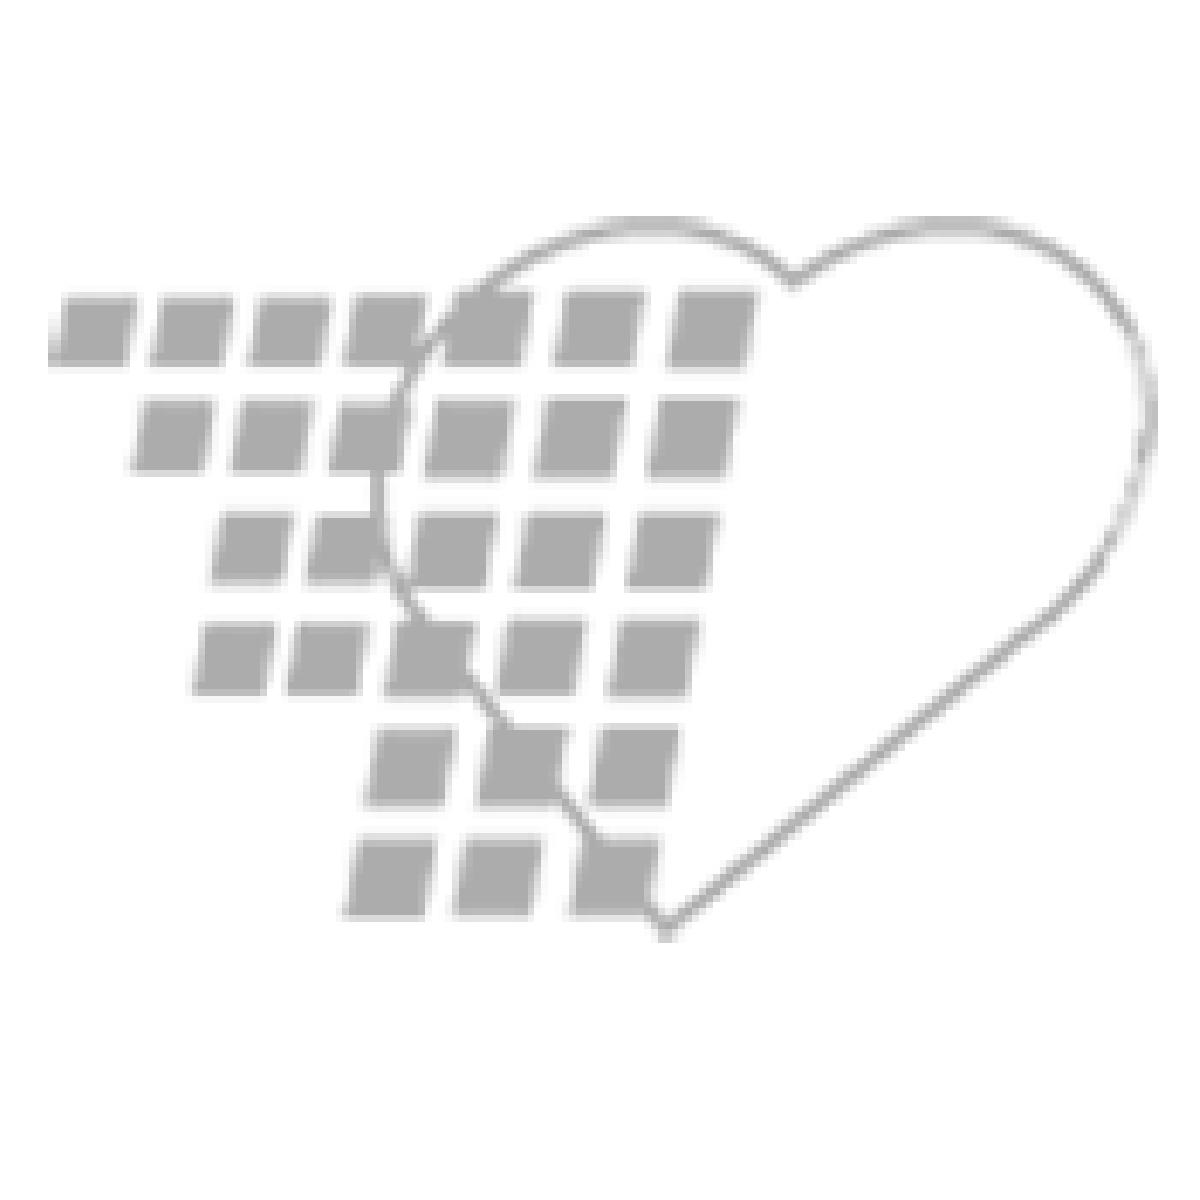 06-67-2232 B.Braun PERIFIX® 18 G x 3½ in. (90 mm) Tuohy 5 mL Glass Luer Lock LOR Single Dose Epidural Tray (Kit)